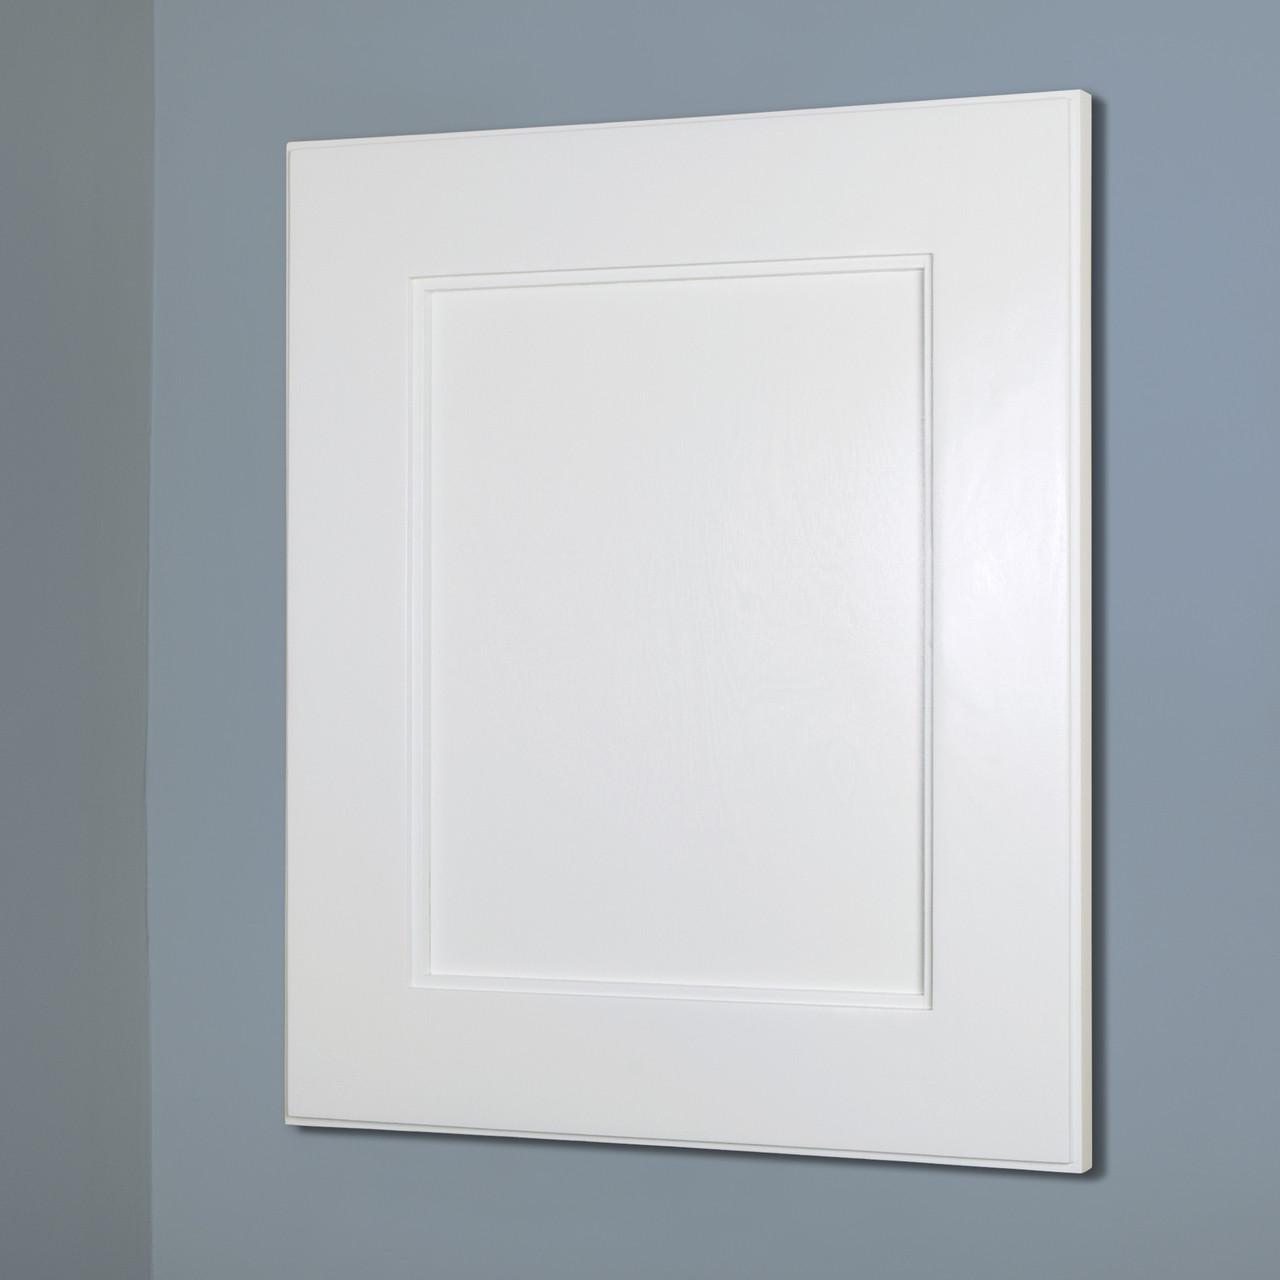 Superieur 14x18 White Shaker Recessed Frame Door Medicine Cabinet